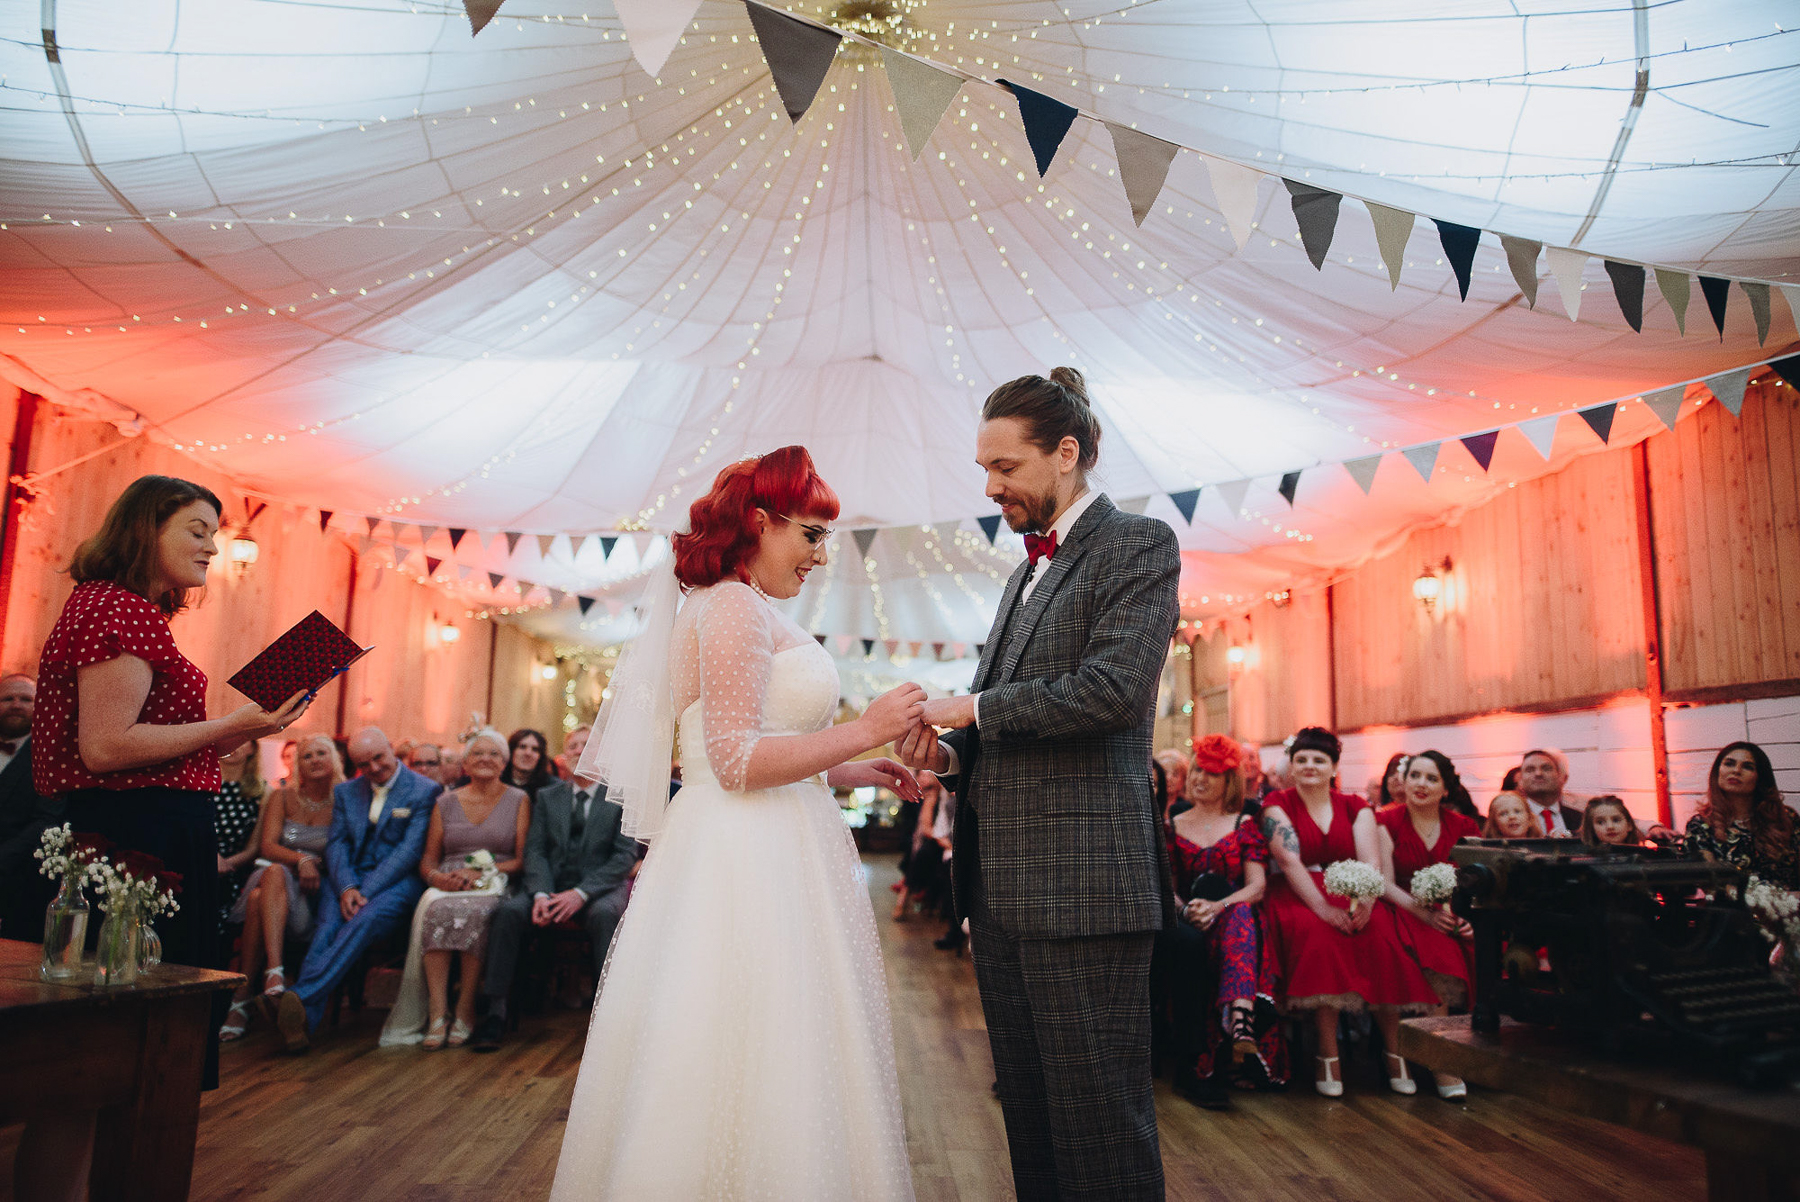 Wellbeing_Farm_Wedding_Photography_The_Pin-Up_Bride_Lara_Shaun-68.jpg